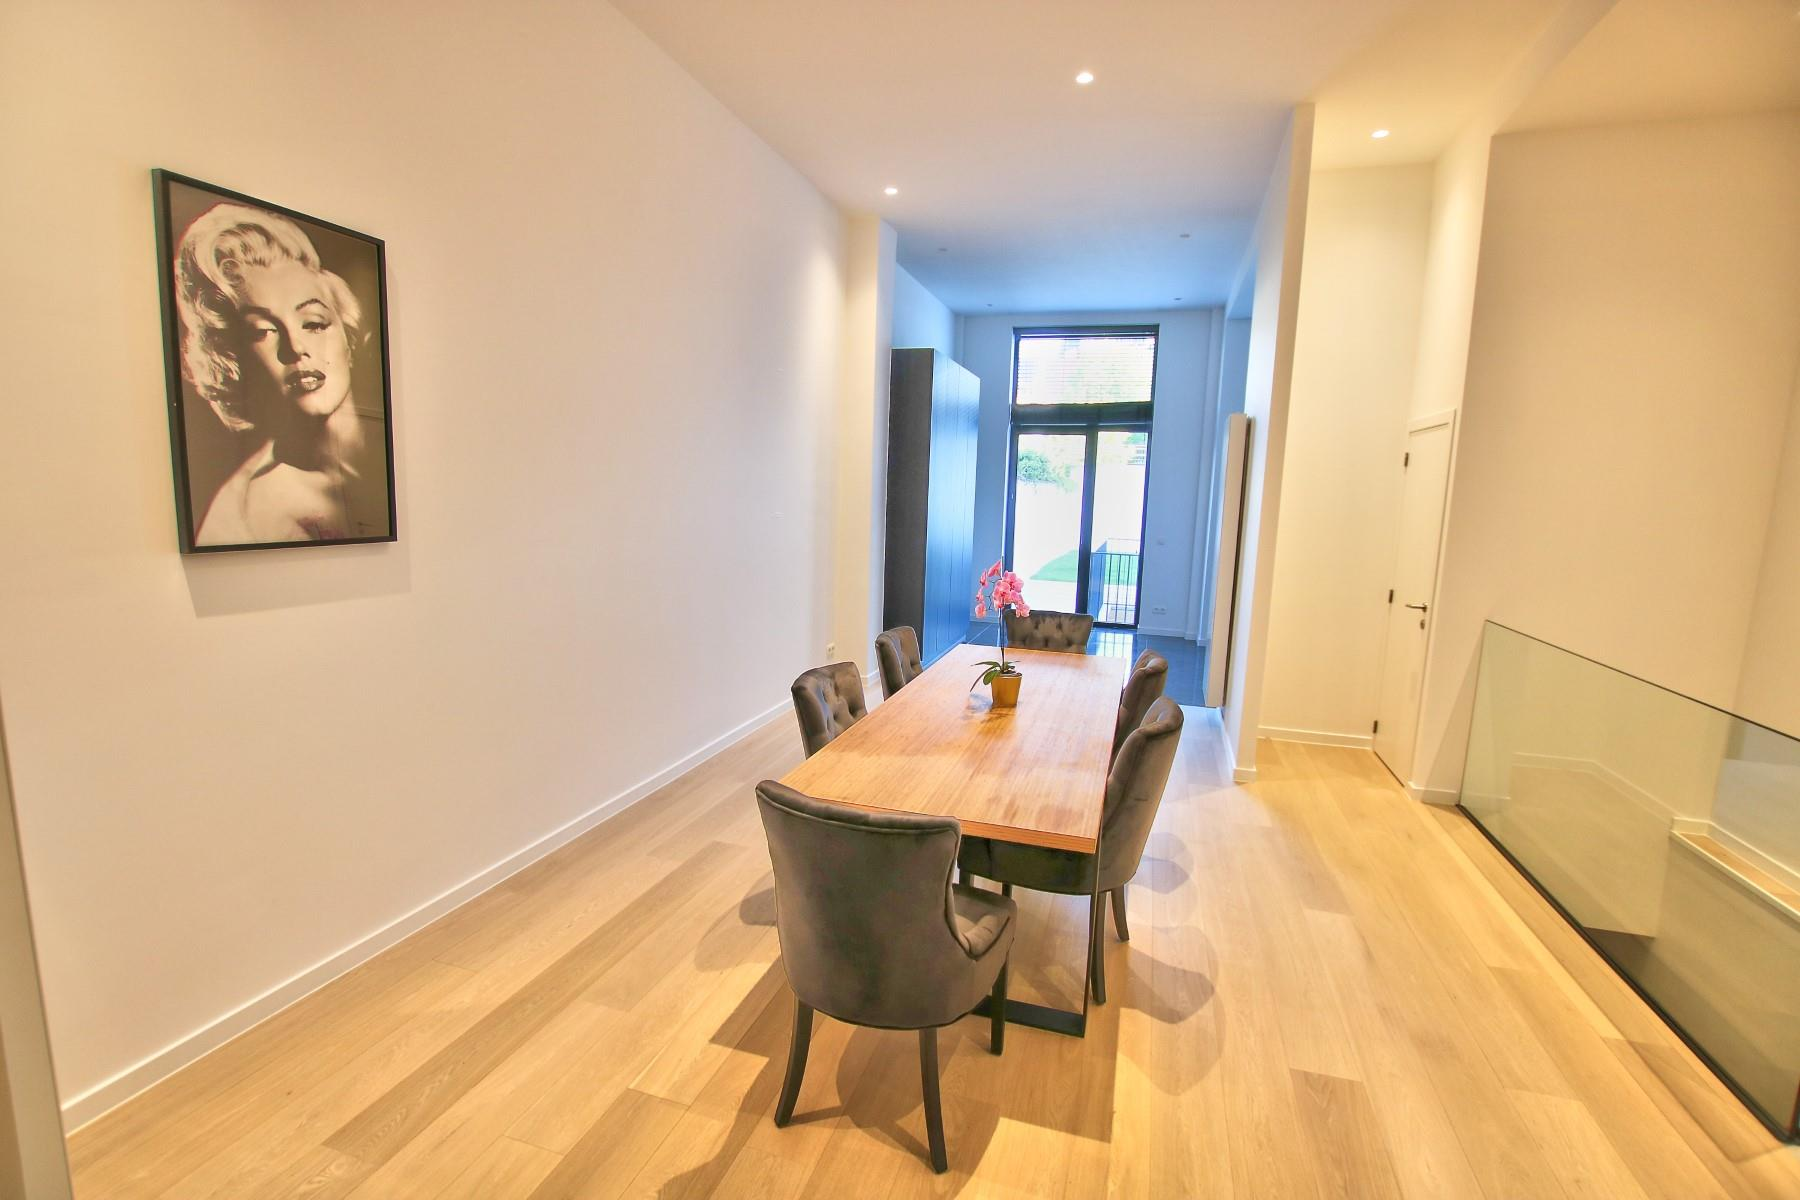 Duplex - Etterbeek - #4255897-3